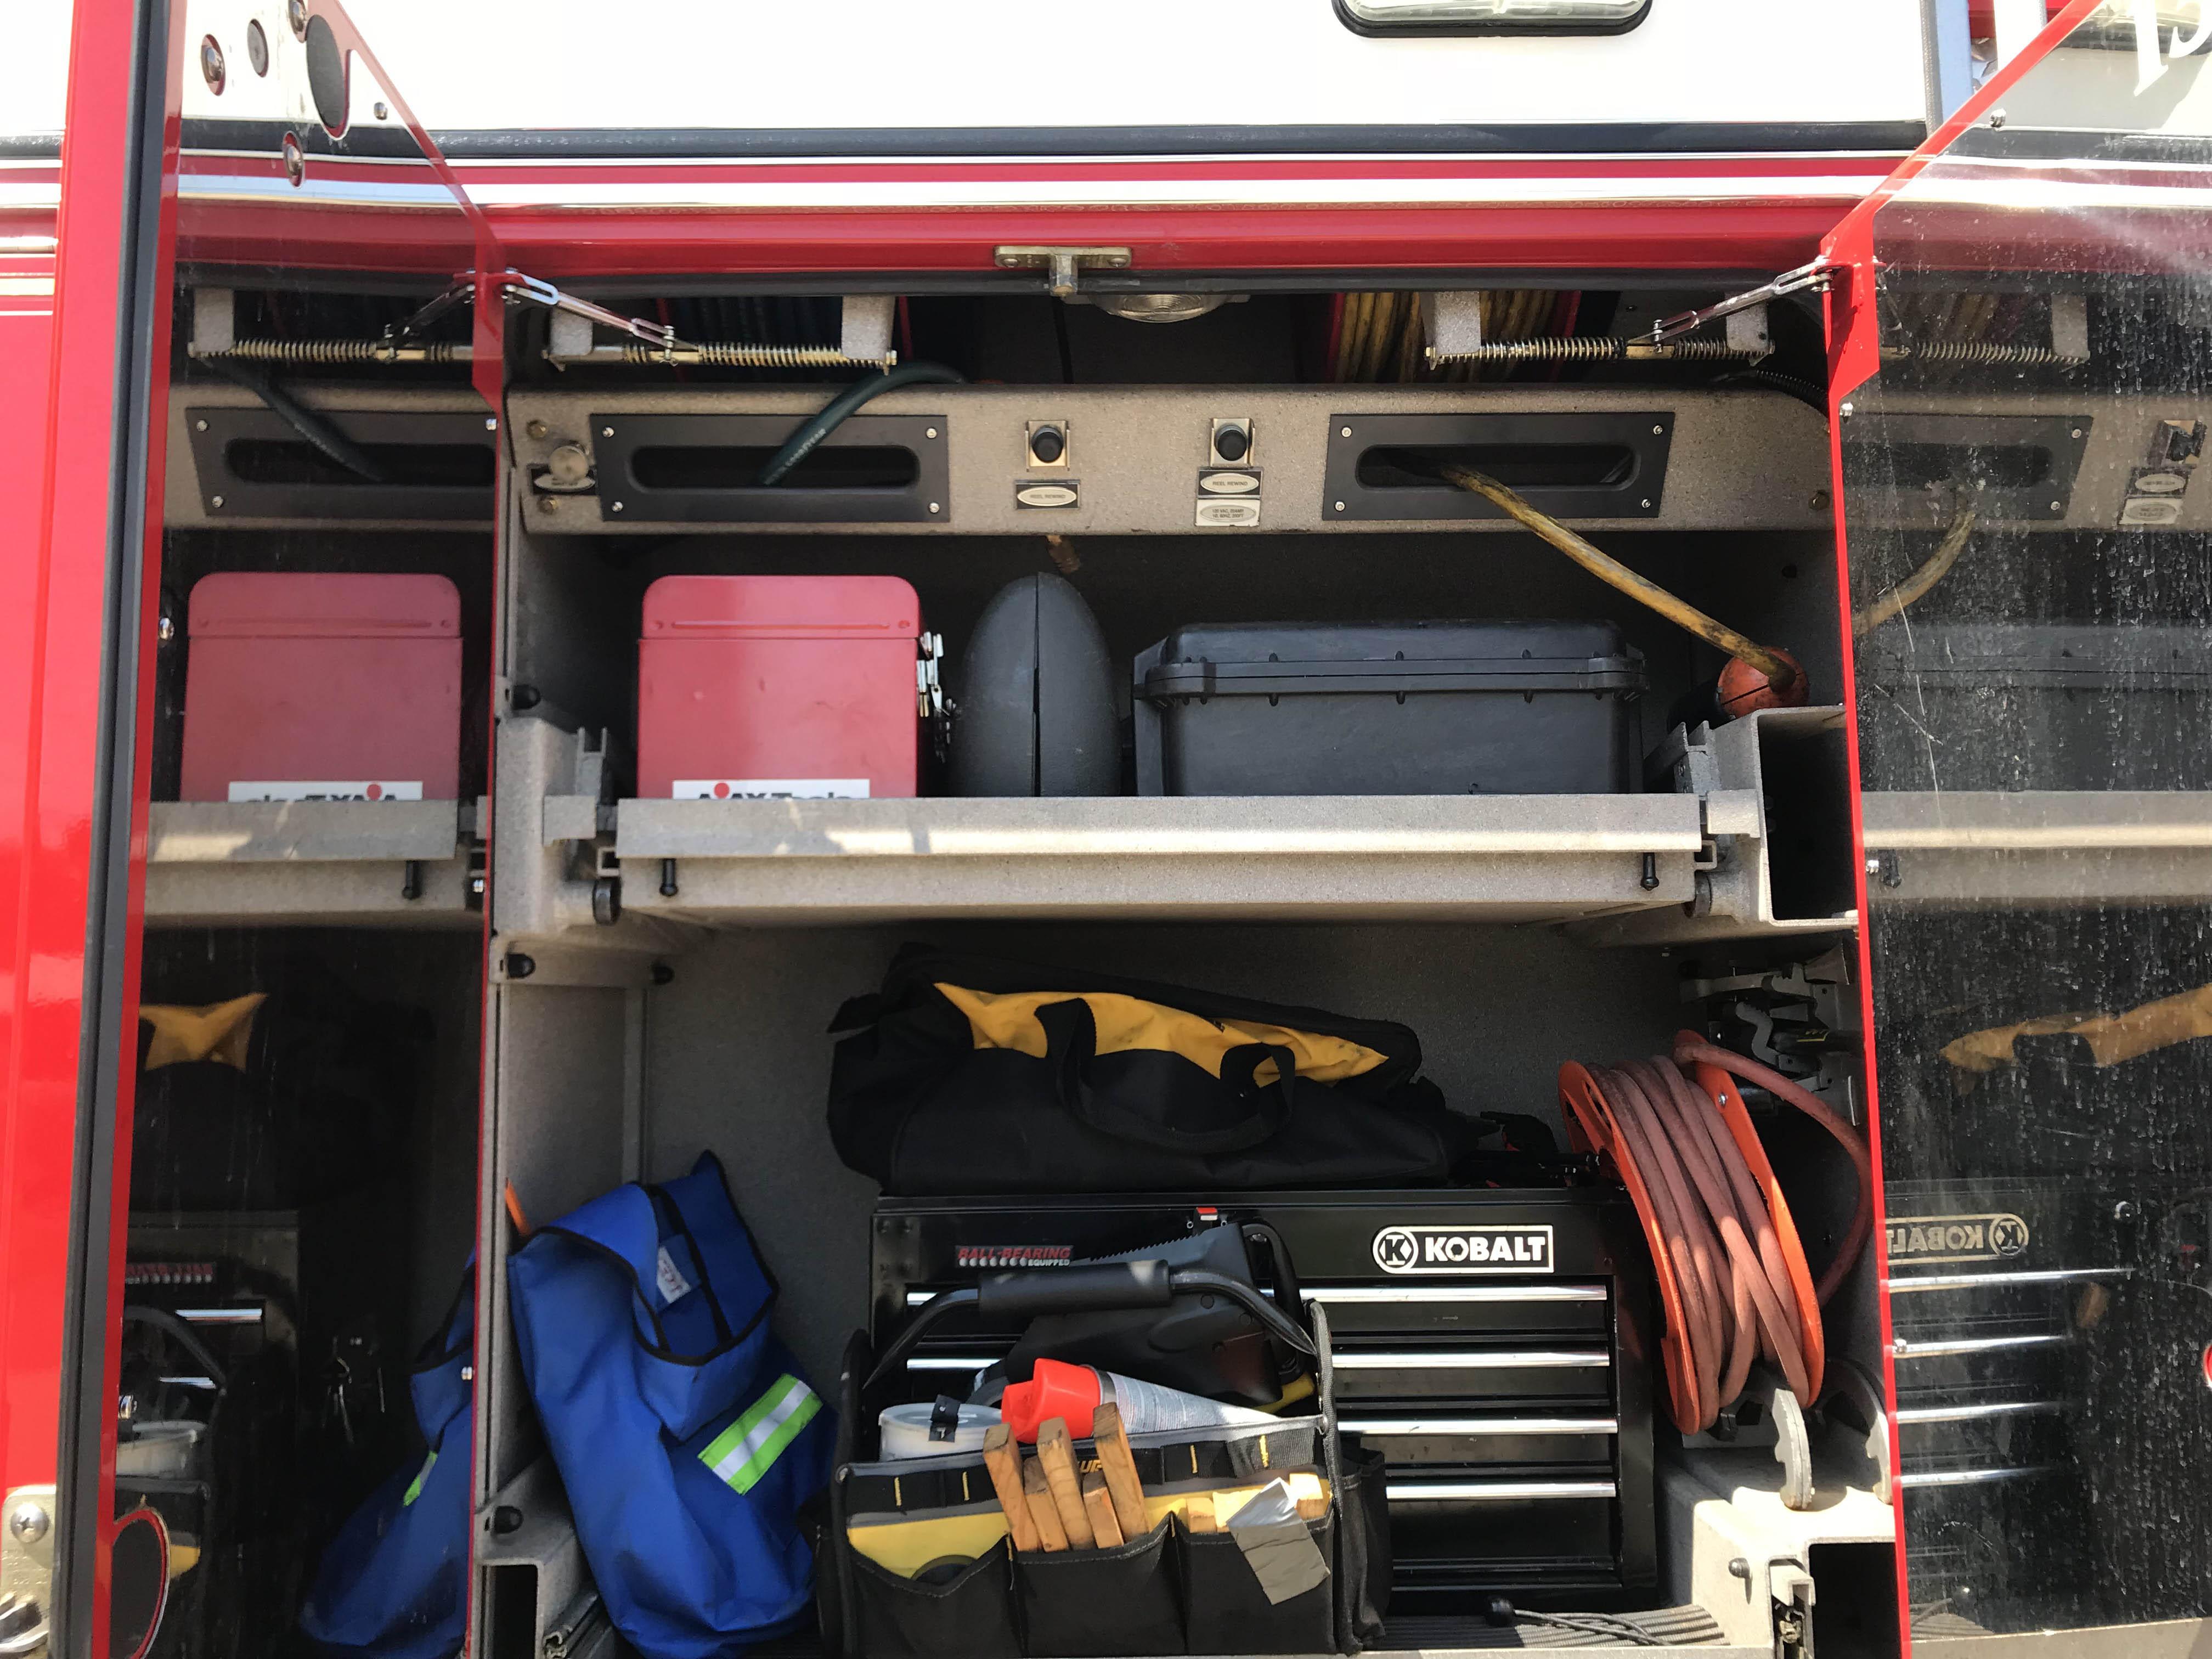 2001 Pierce Dash Rescue Pumper | Used Truck Details